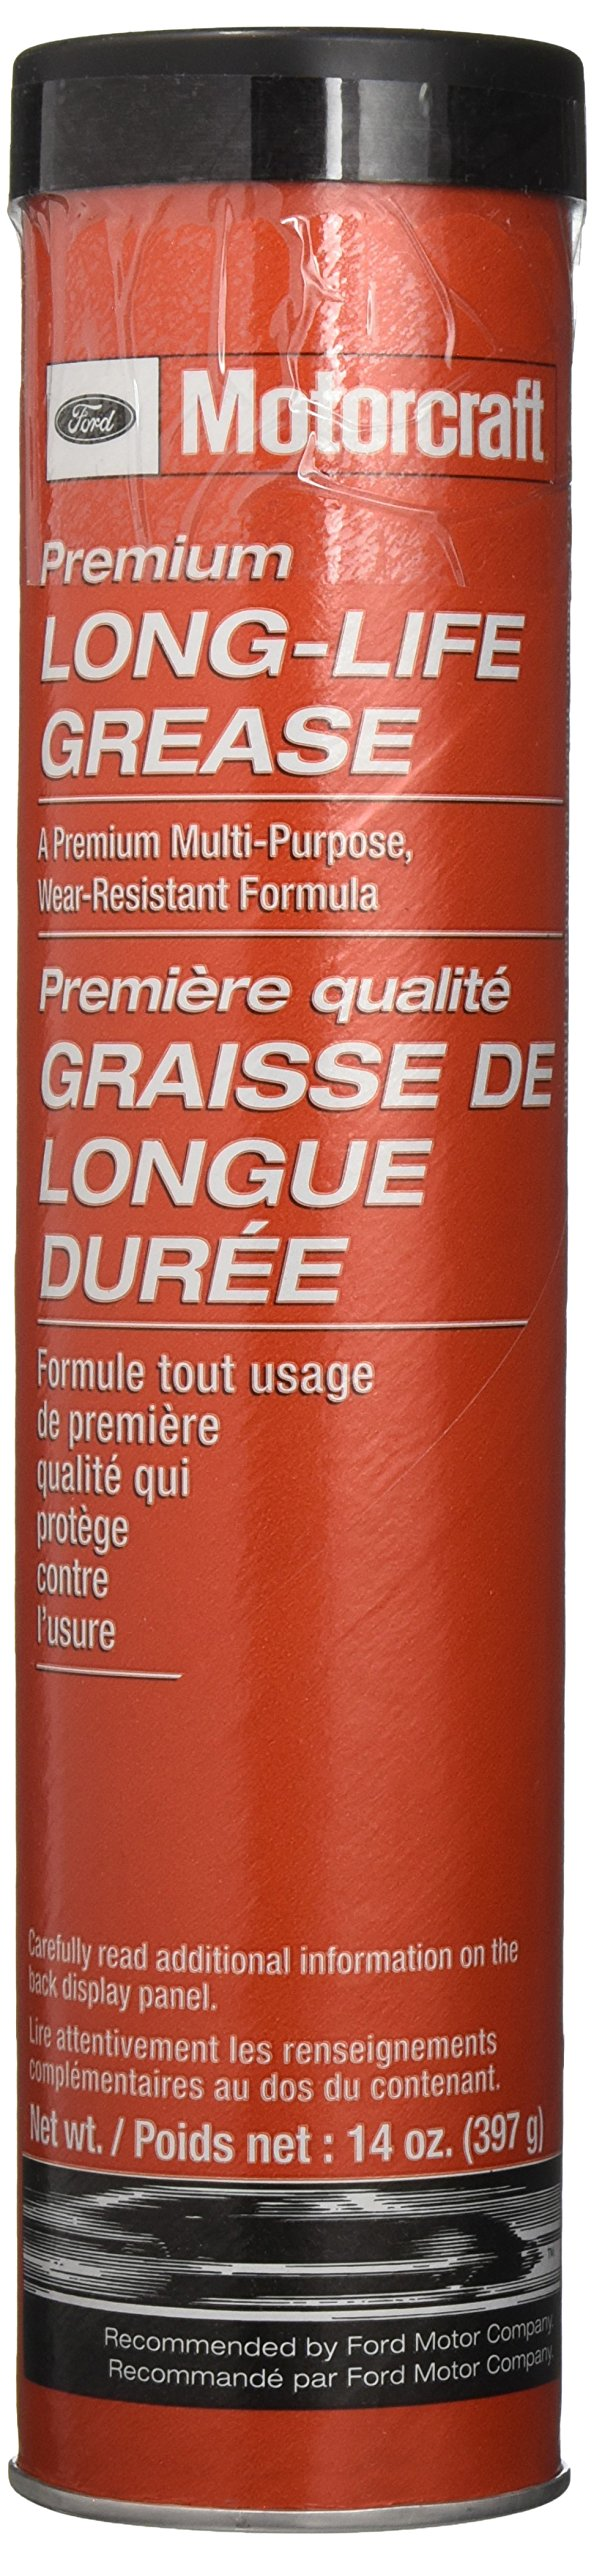 Ford Genuine Fluid XG-1-C Premium Long-Life Grease - 14 oz